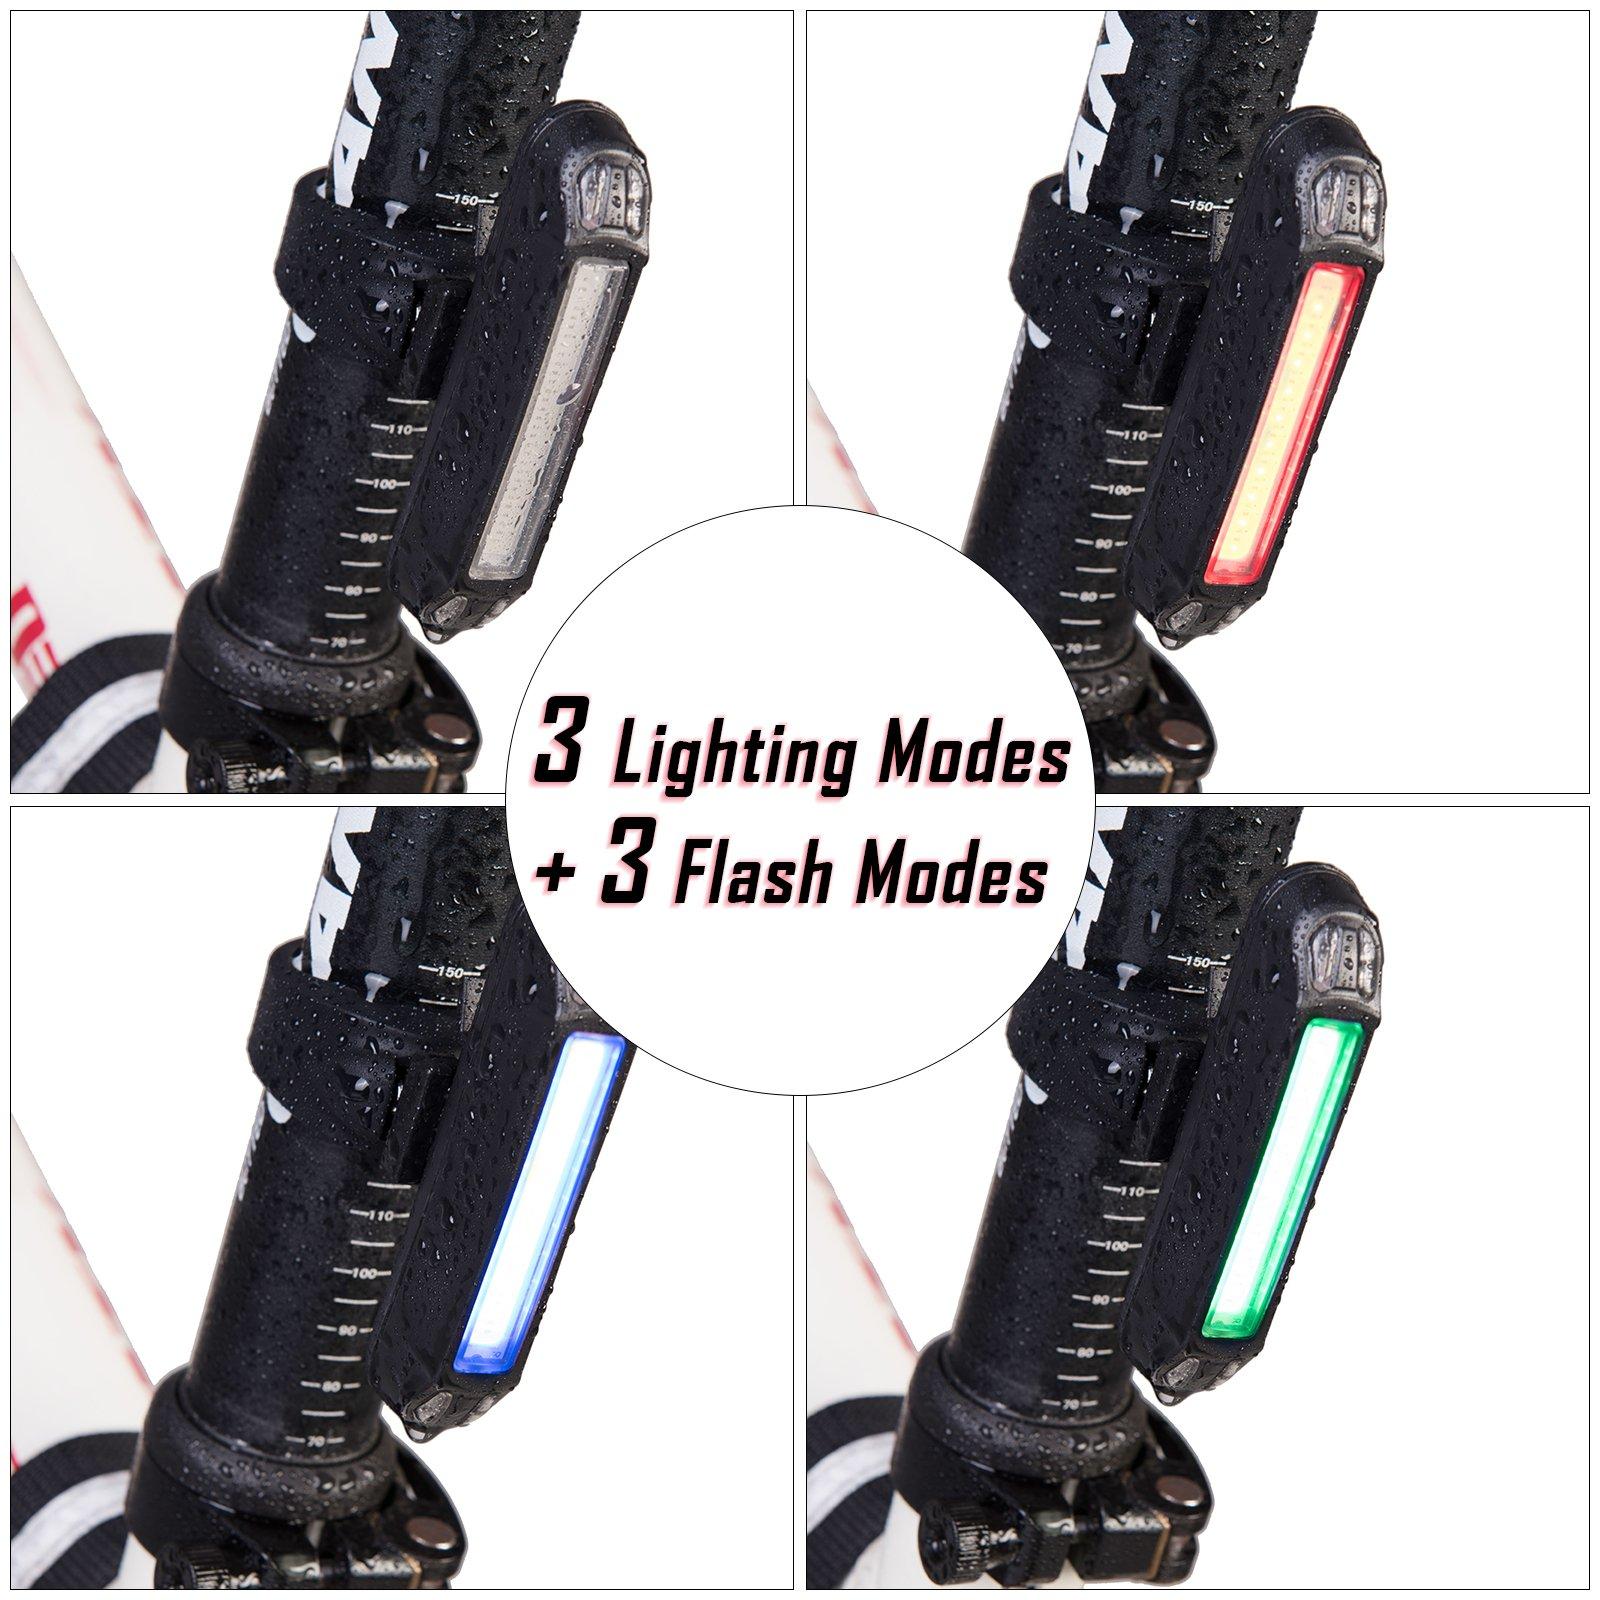 Taktik Super Bright Bike Lights Set Rechargeable - Safety 500 Lumens Front and Back Bicycle Lights 2000 mAh Waterproof LED Bike Light For Bike,Road Bike,Mountain Bike,Light Bike Night Rider by Taktik (Image #5)